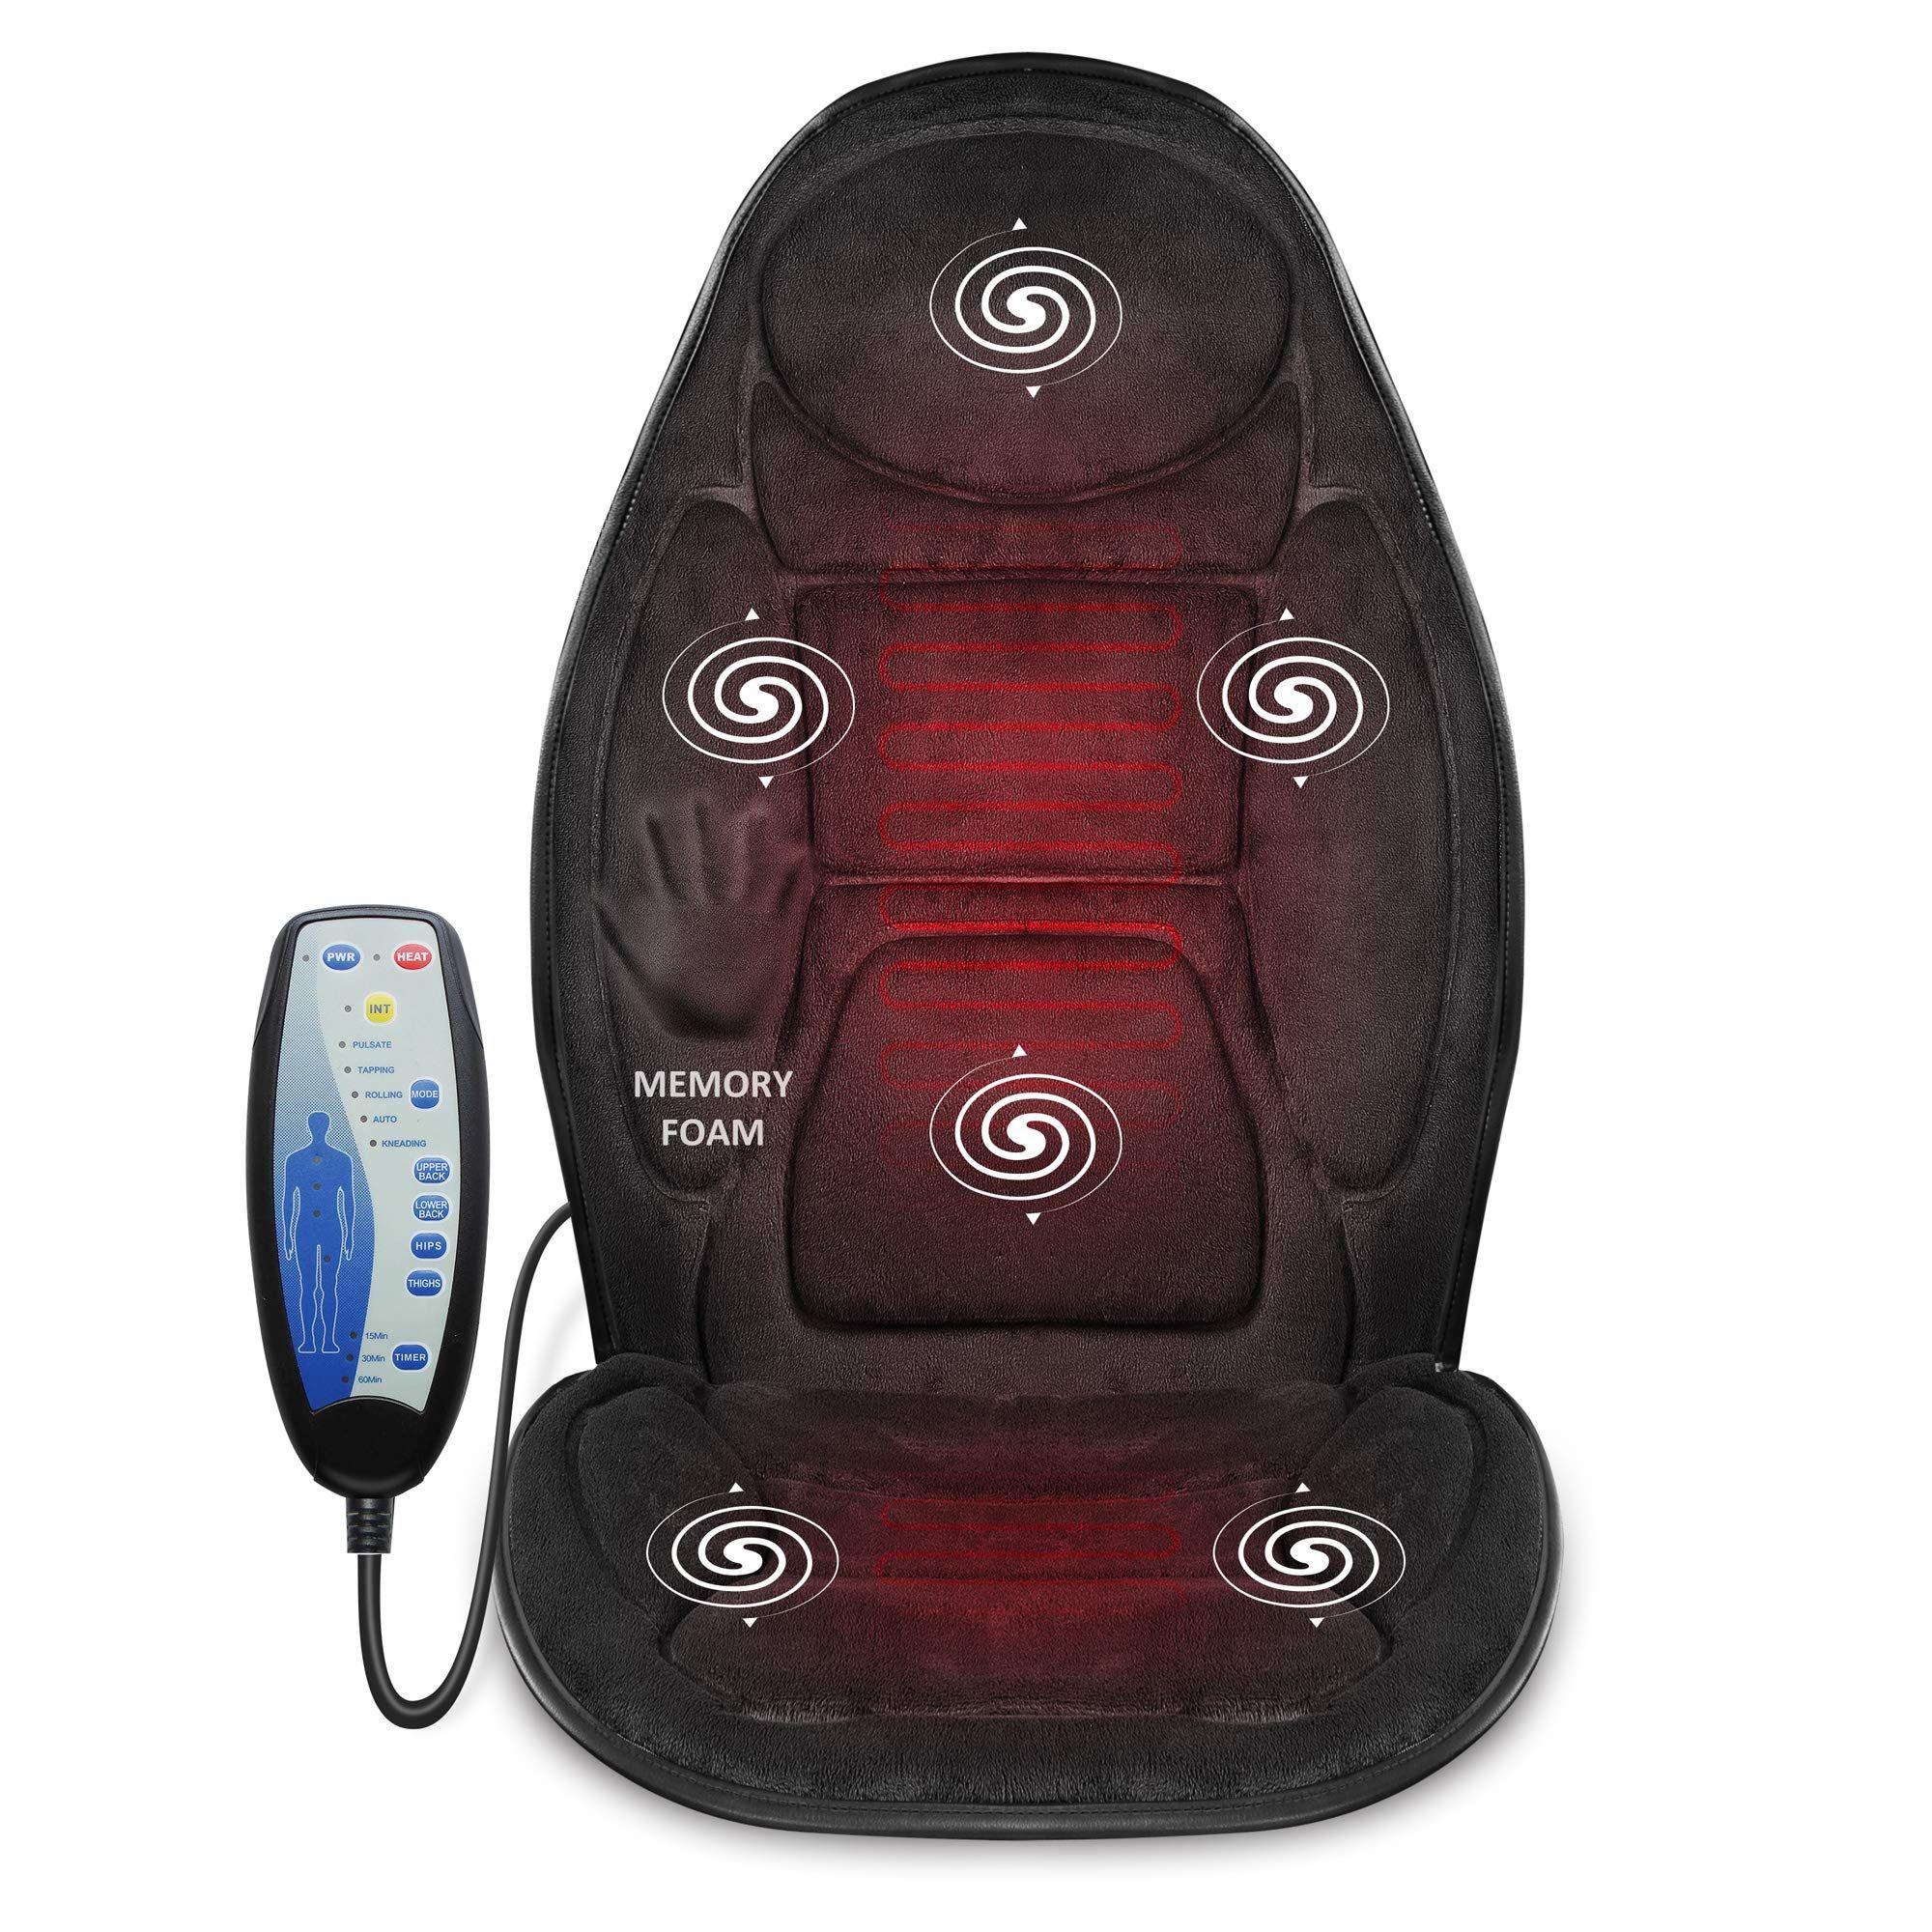 Snailax Memory Foam Massage Seat Cushion Back Massager With Heat 6 Vibration Massage Nodes Amp 3 Heating Pad Massag Massage Chair Chair Pads Seat Cushions